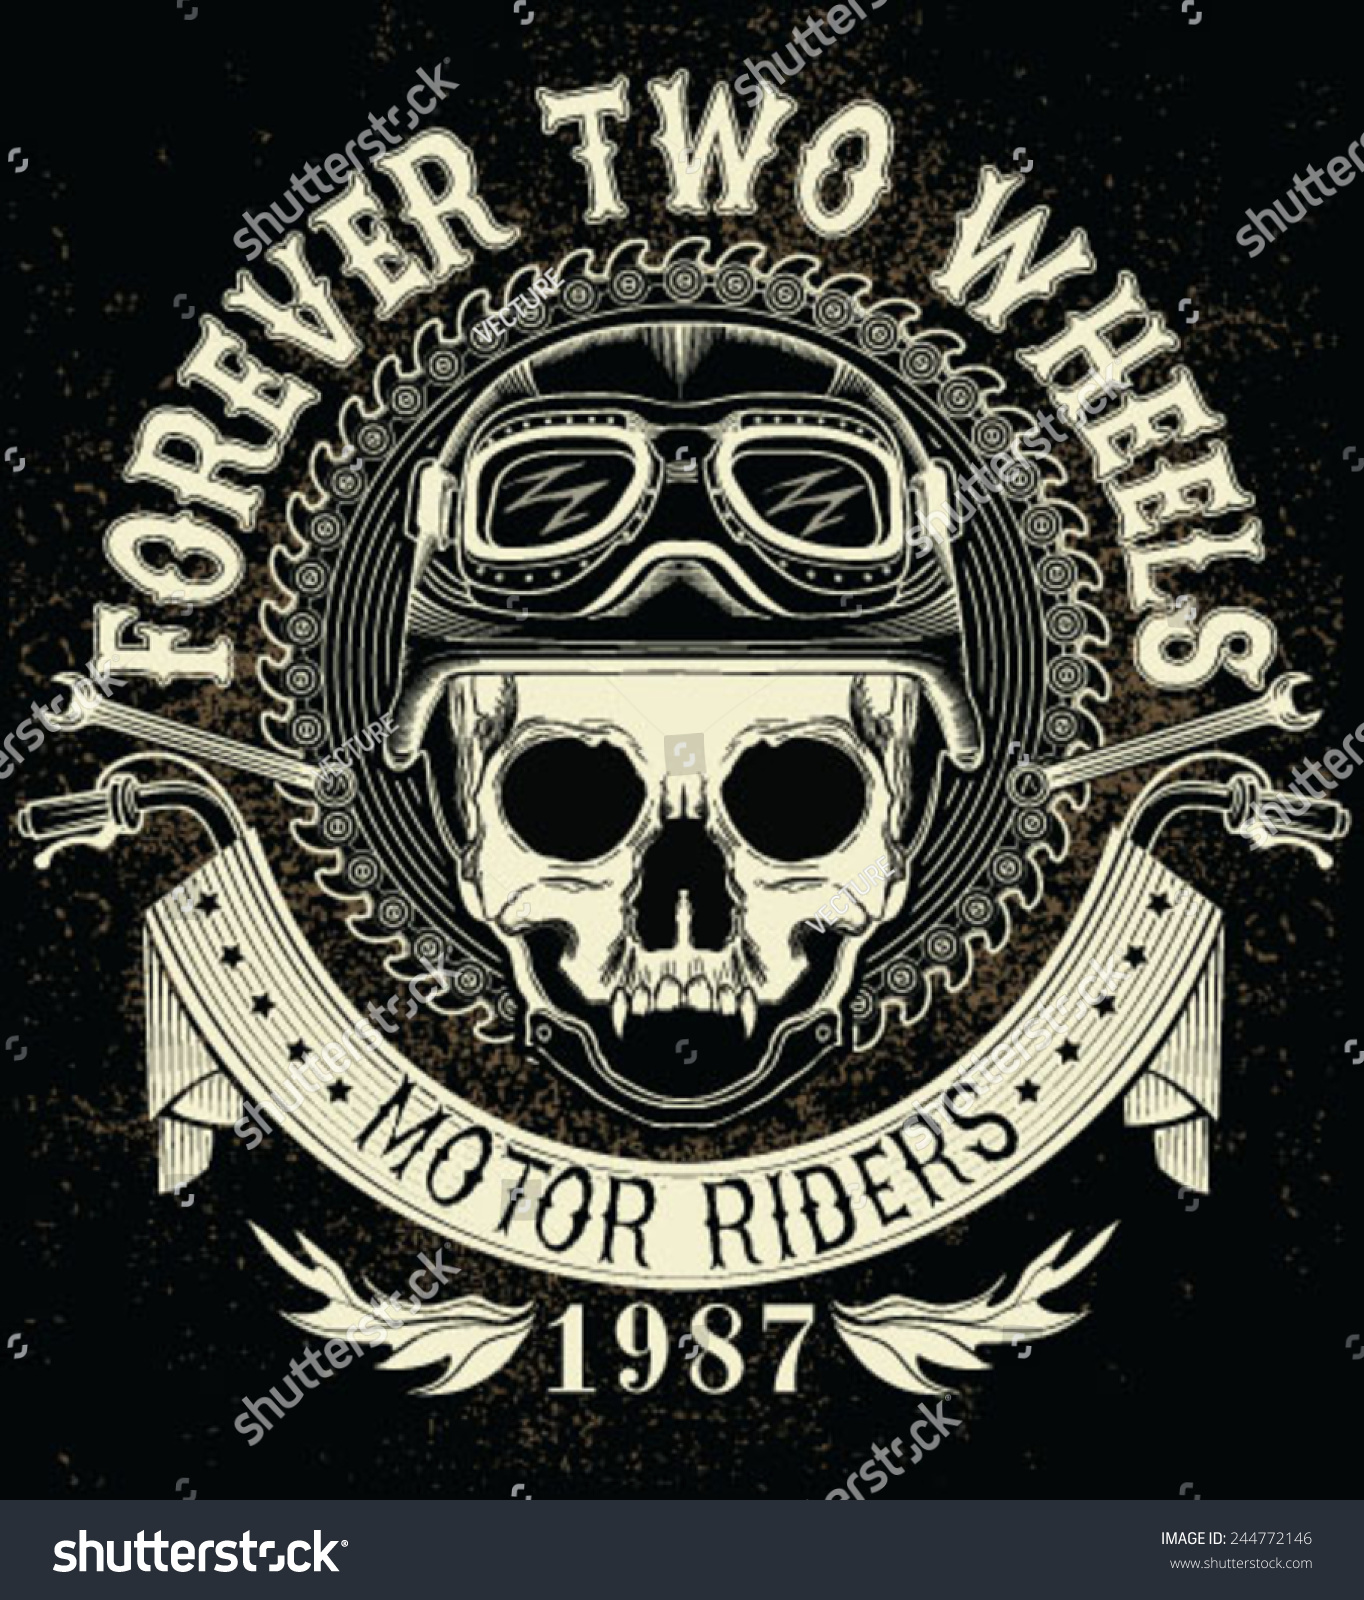 bikers skull logo - photo #13